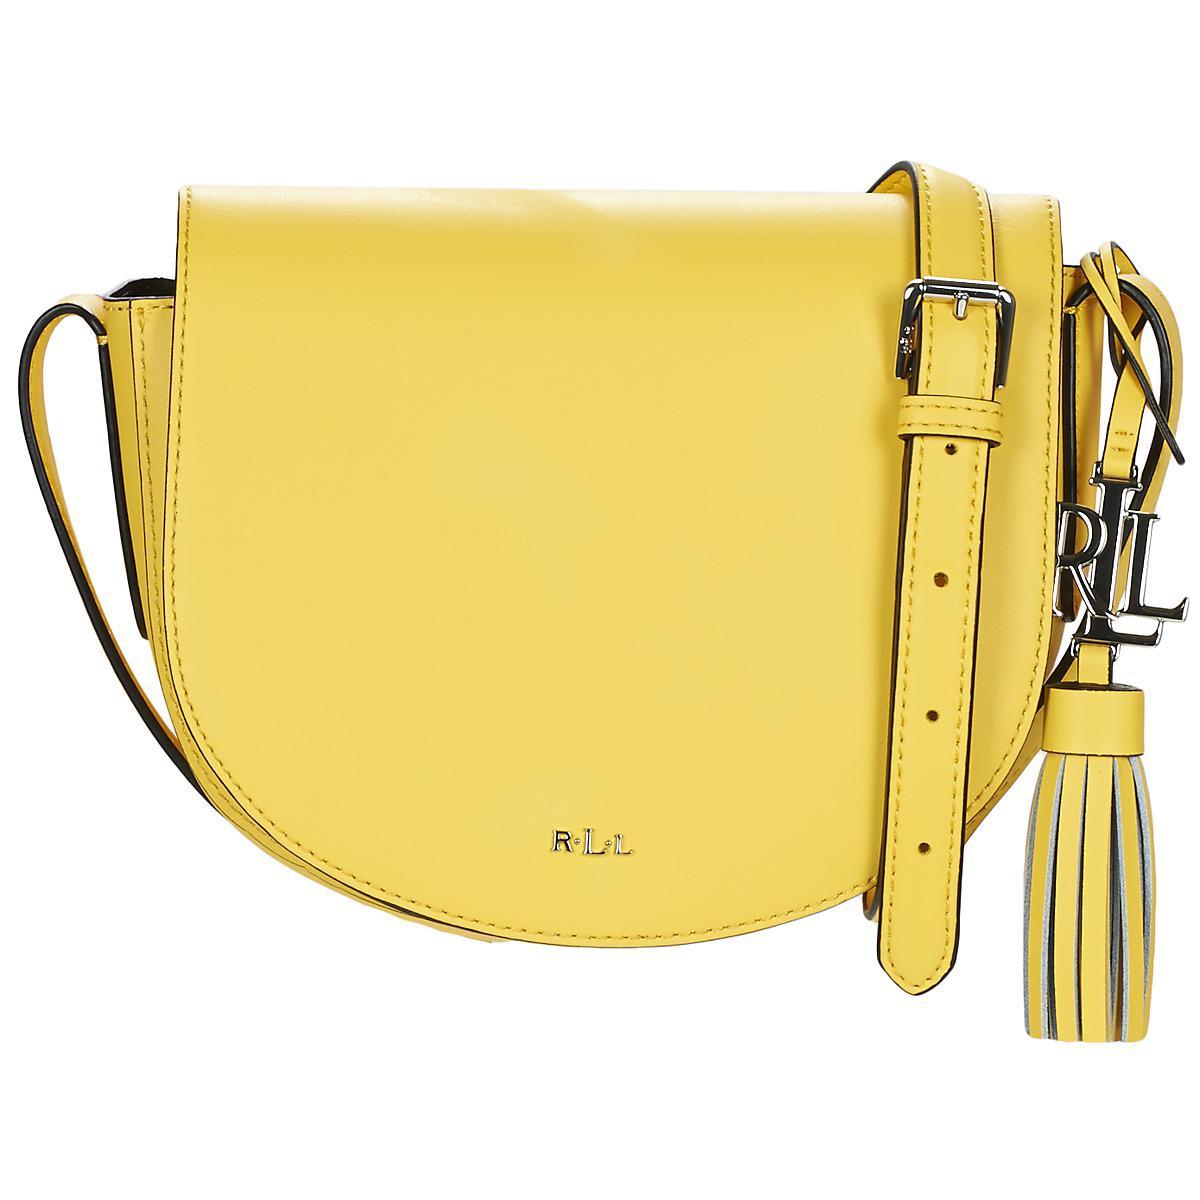 c97fb4a15127 Ralph Lauren Dryden Caley Mini Saddle Shoulder Bag in Yellow - Lyst